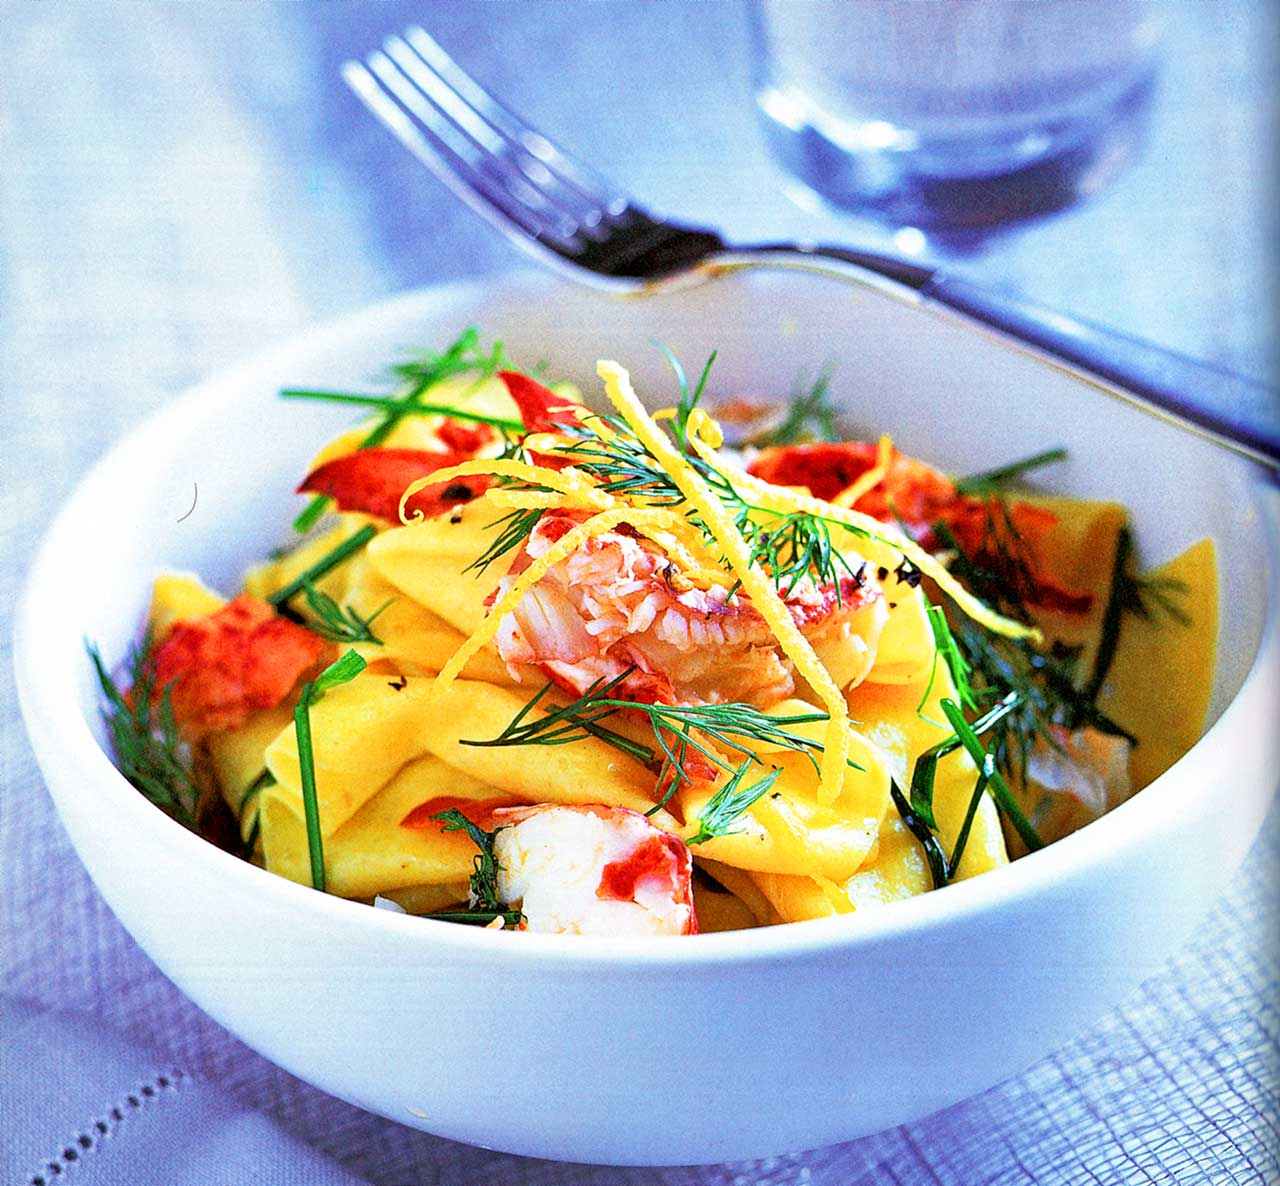 Seafood pasta recipes-seafood pasta sauce recipe www.eatopic.com